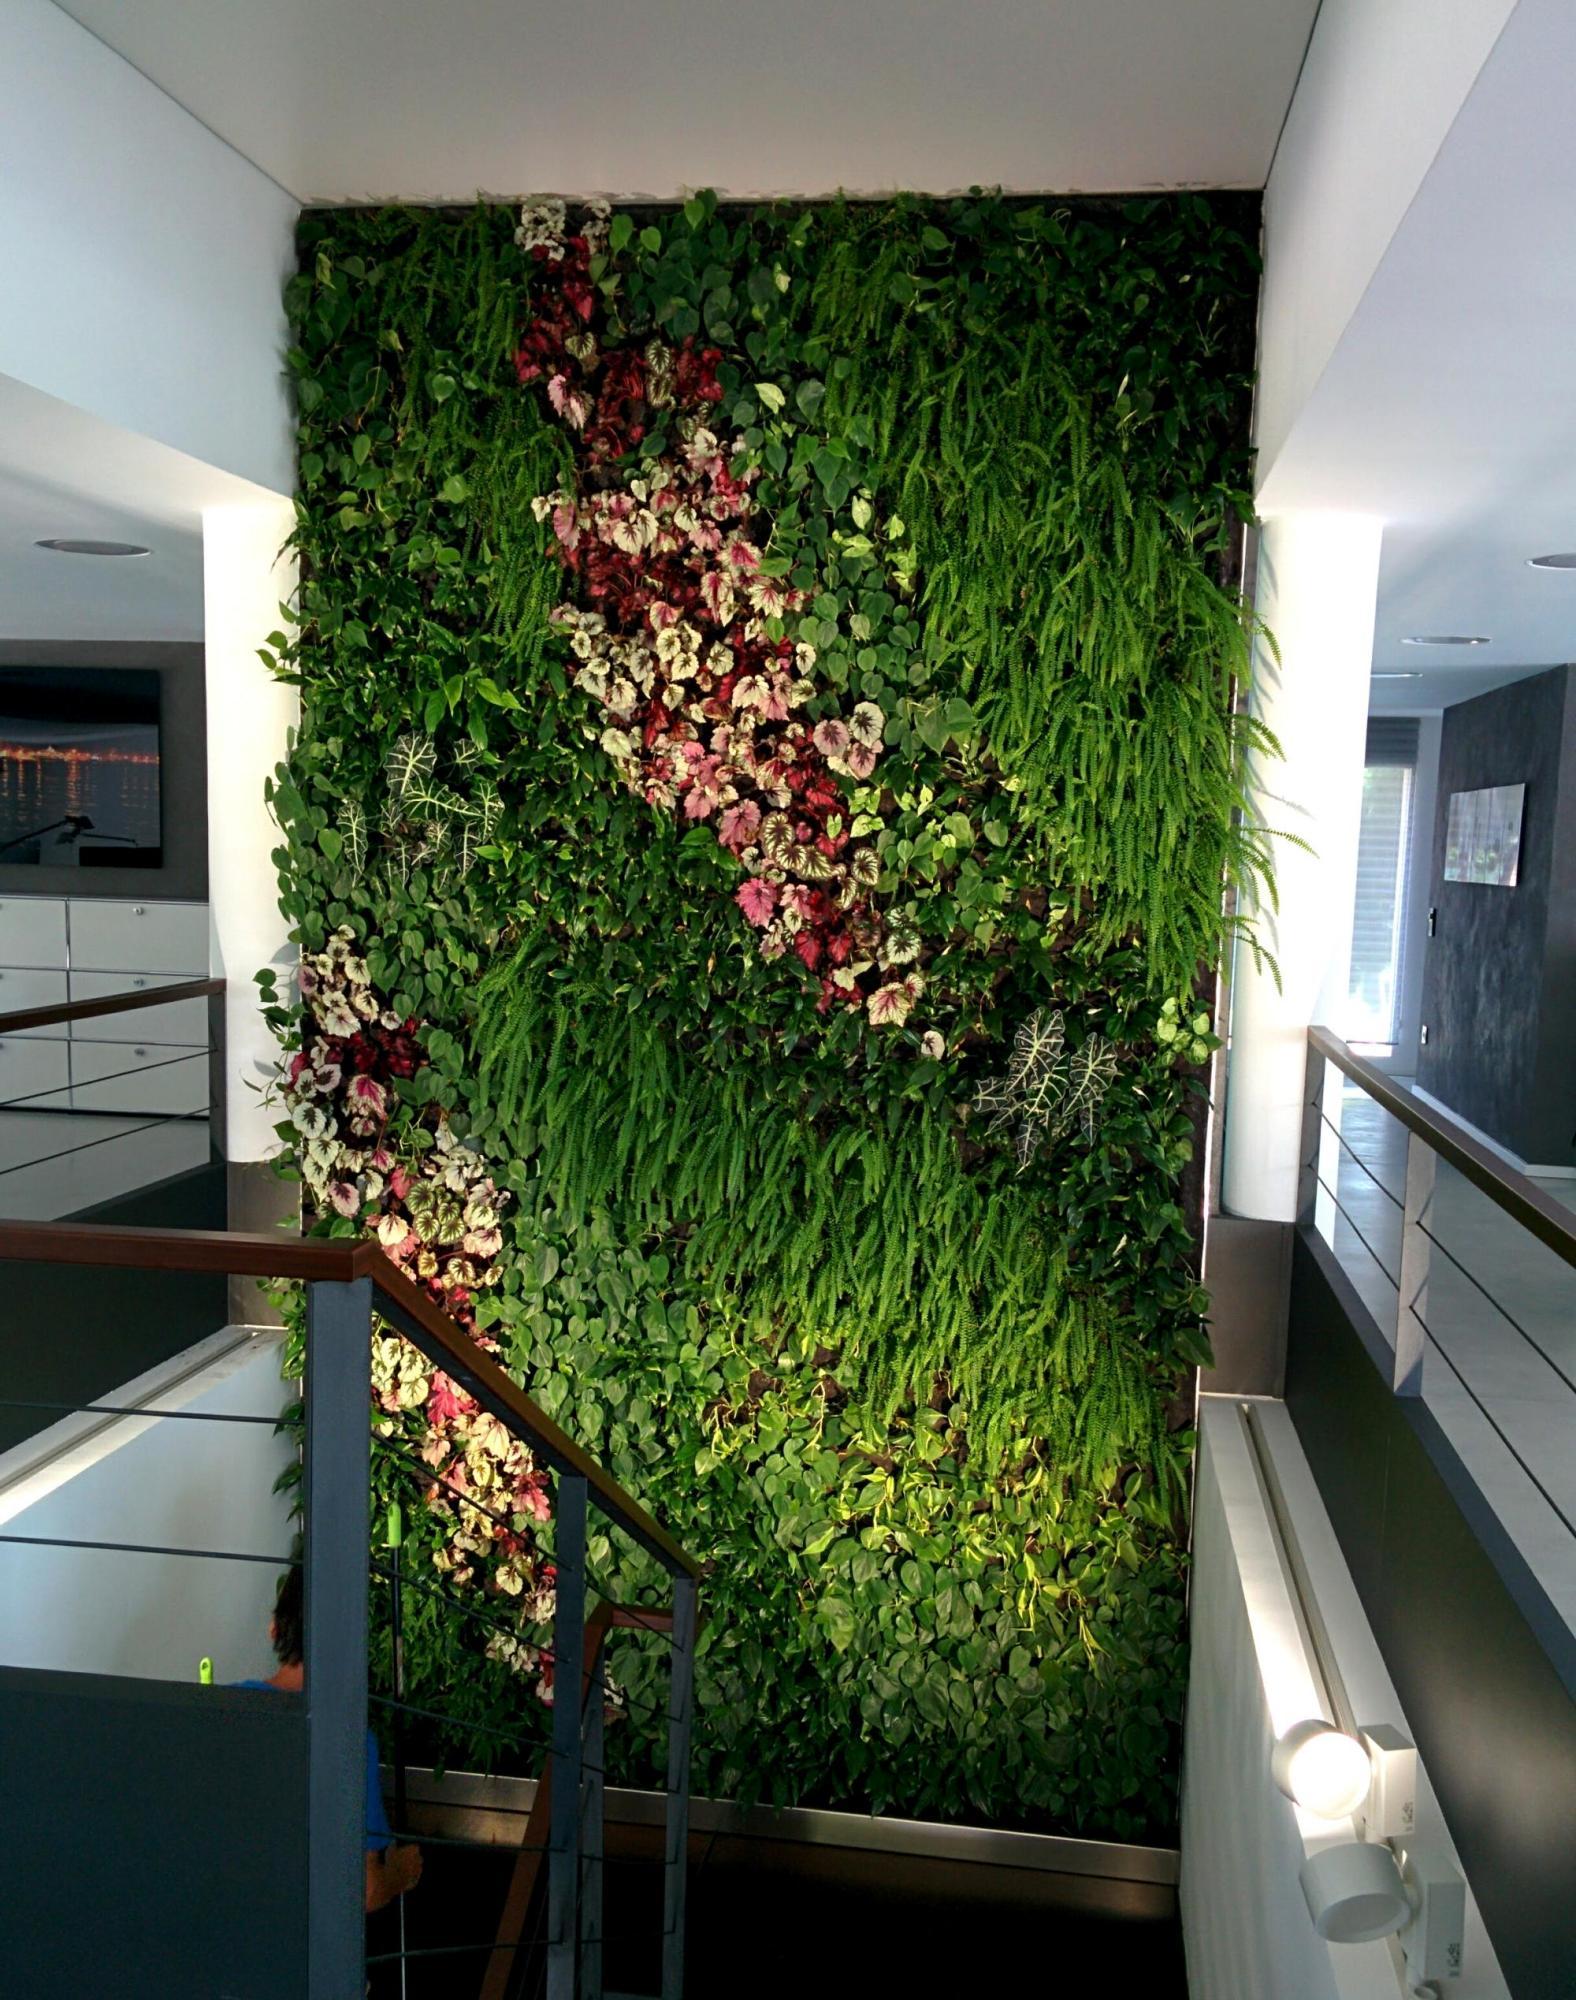 Jard n vertical en mallorca santa pon a alicante forestal for Plantas recomendadas para jardin vertical